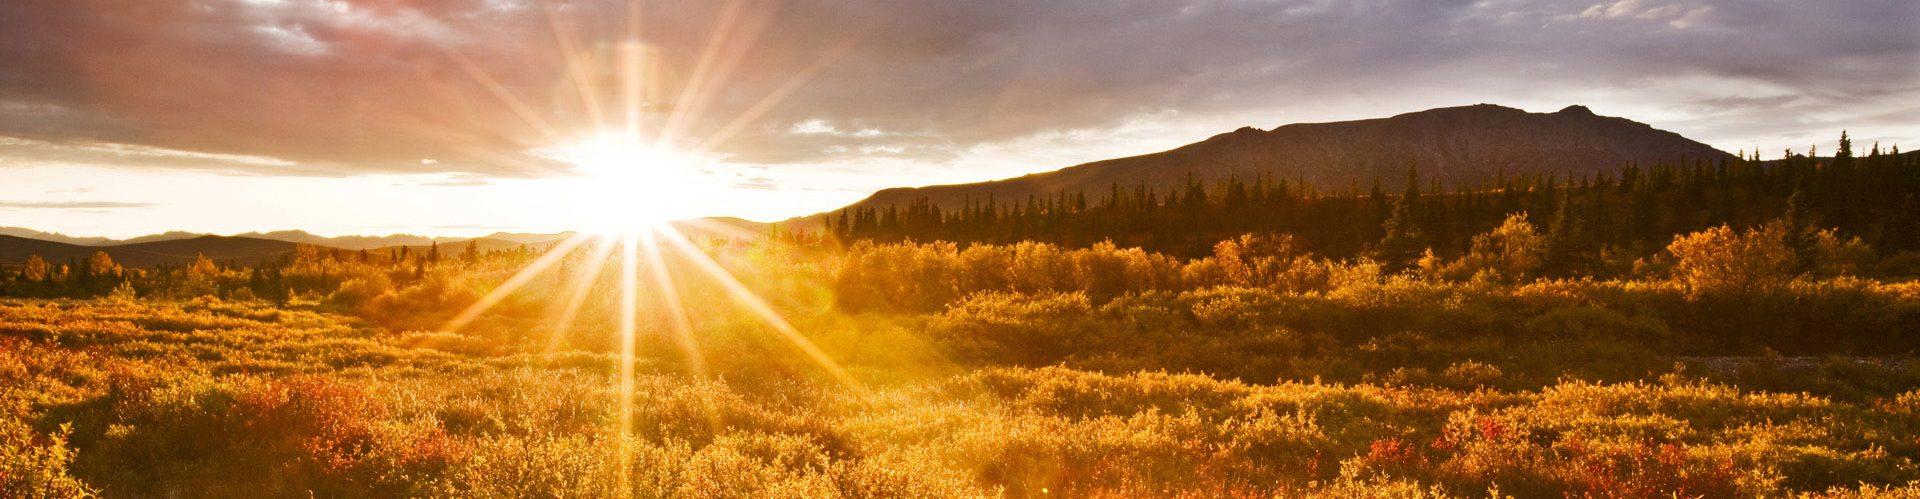 https://site.ngkerkmoregloed.co.za/wp/wp-content/uploads/2021/07/cropped-free-sunrise-wallpaper-1.jpg